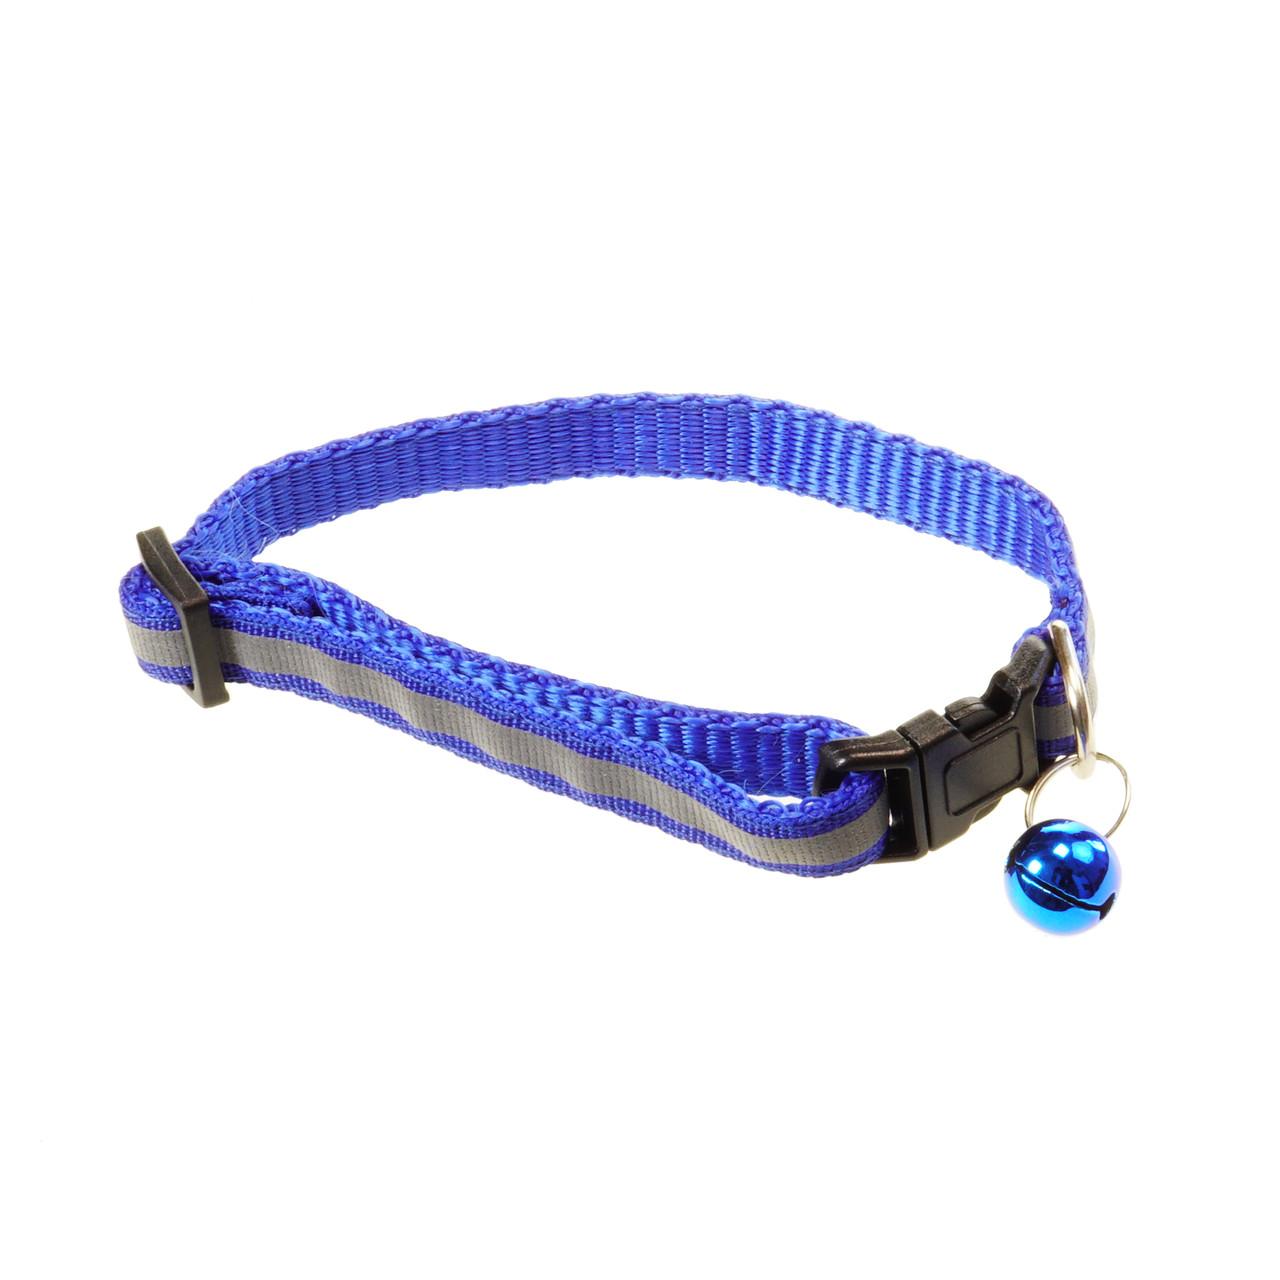 Светоотражающий ошейник Supretto 20-32 см Синий (57550002)